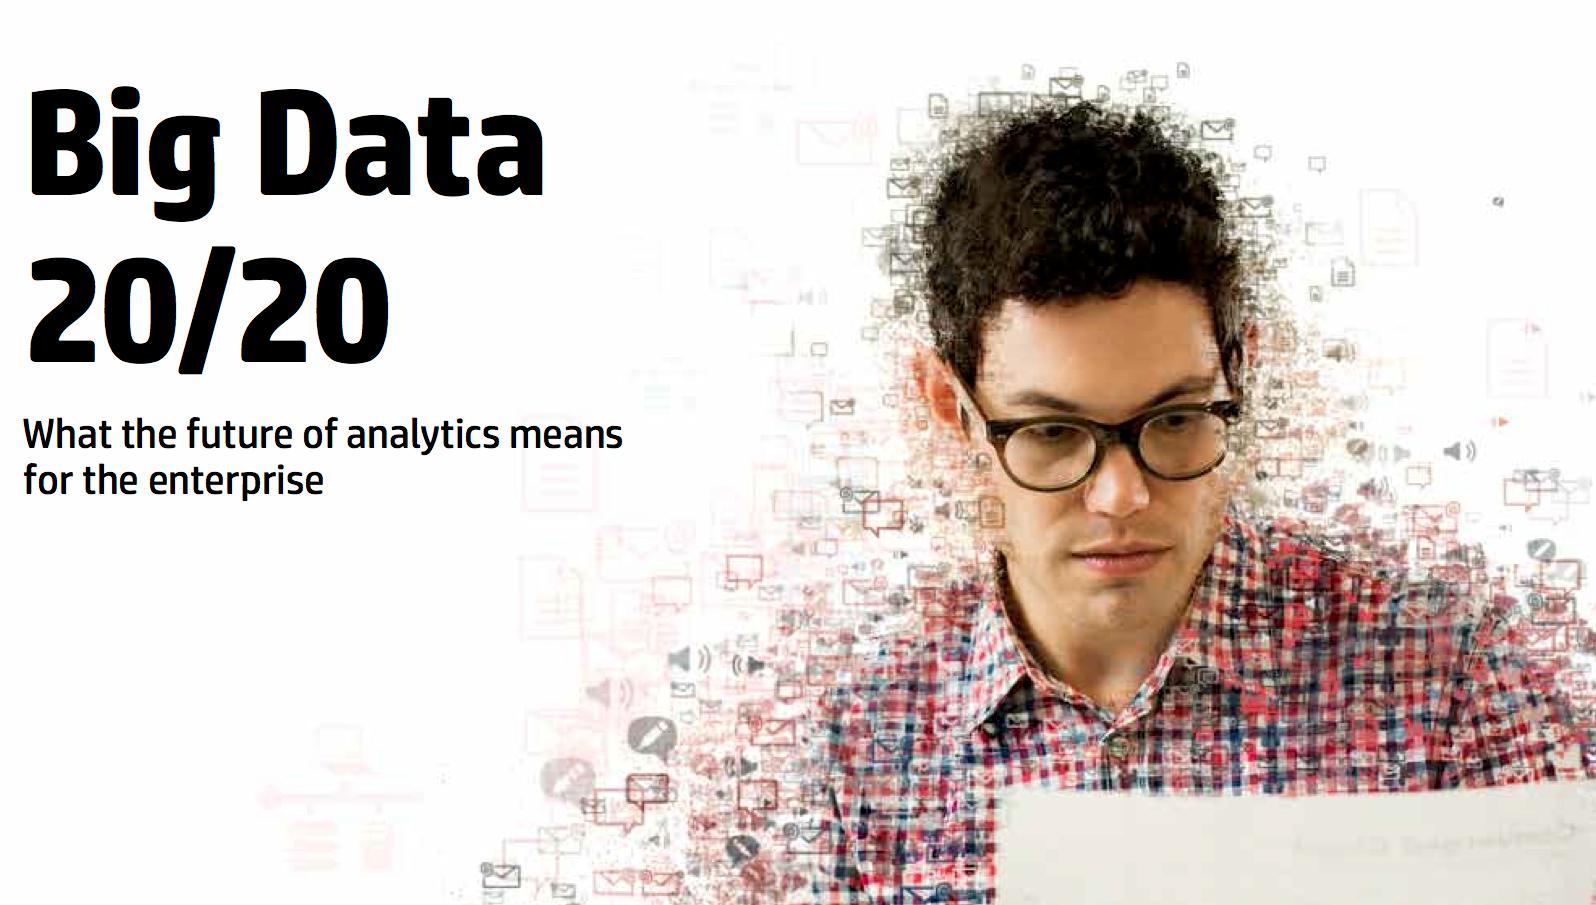 bigdata2020 chapter.png